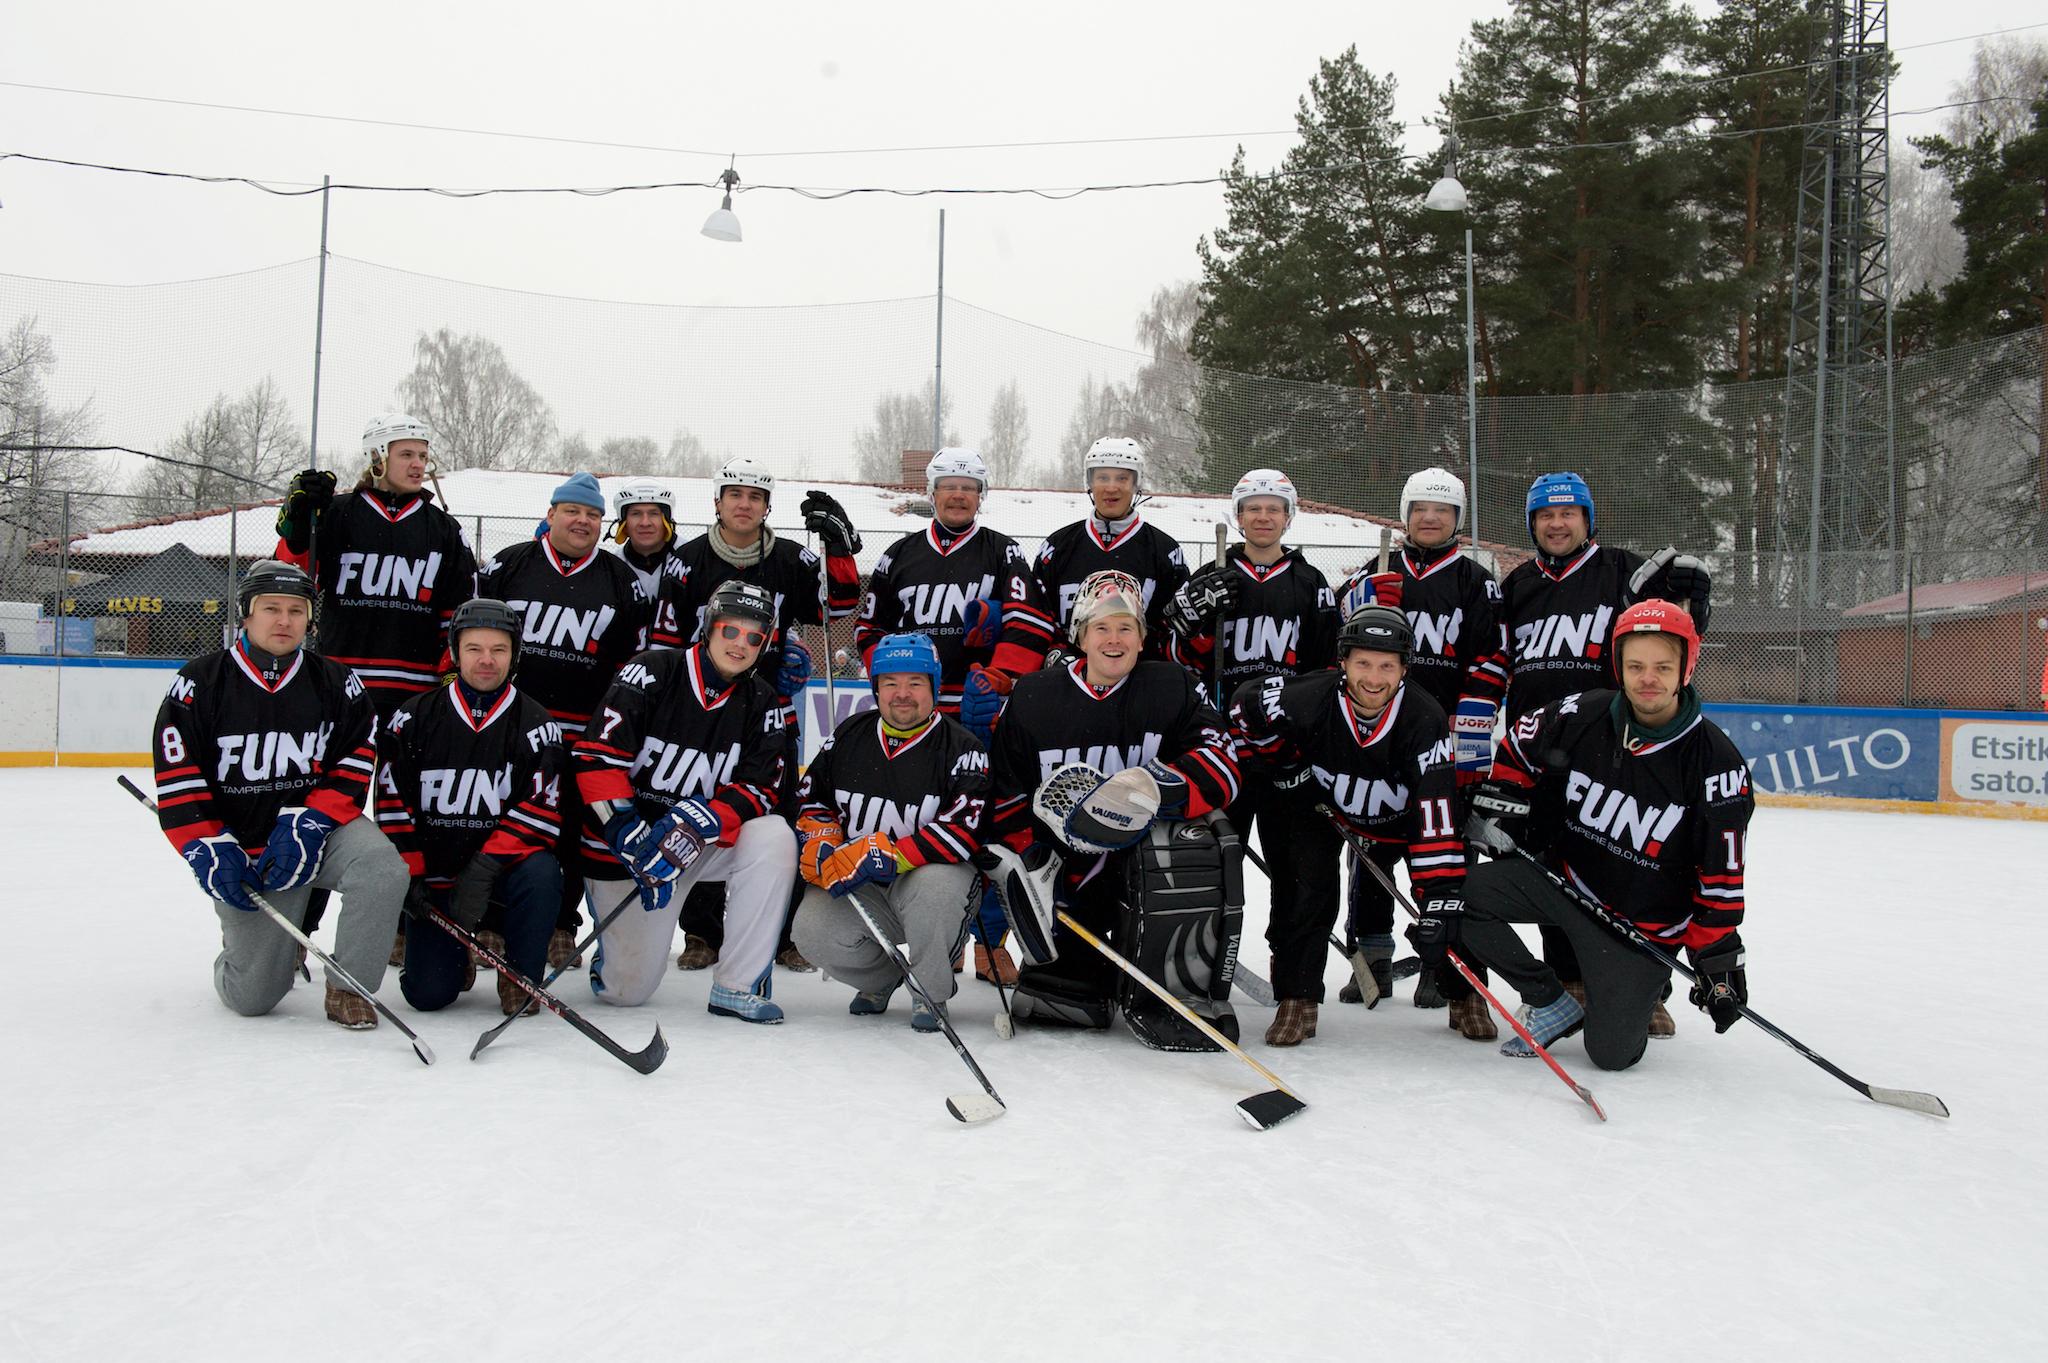 FUN Tampere 2016